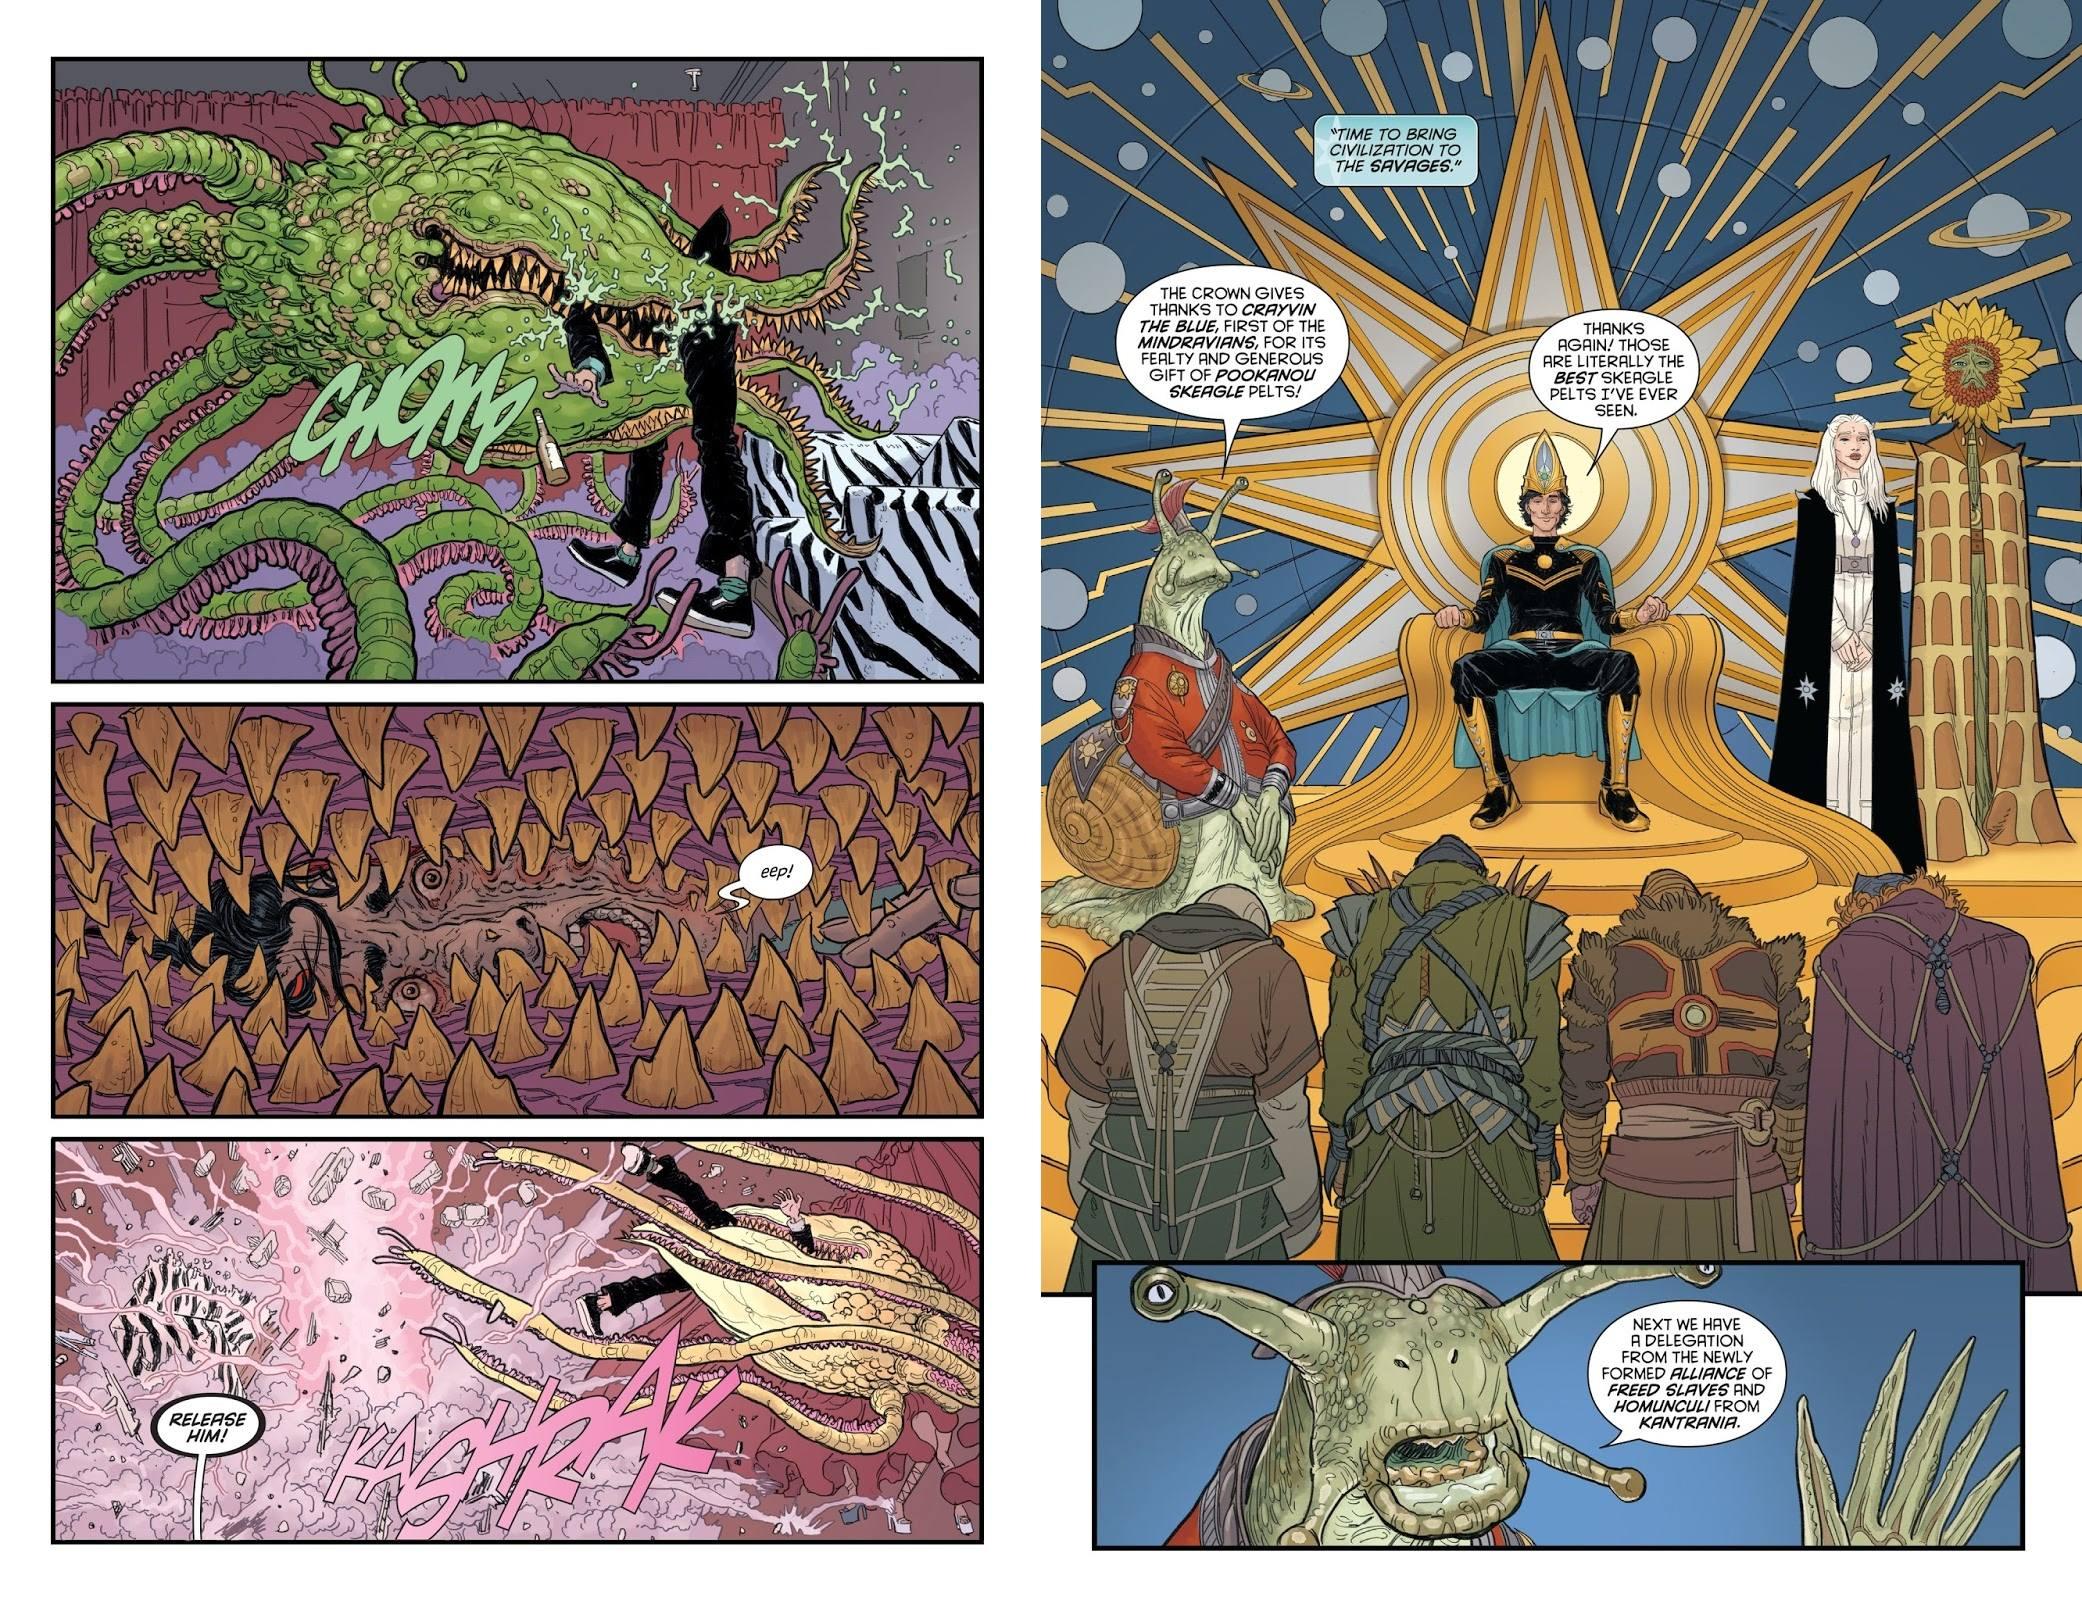 Maestros graphic novel review